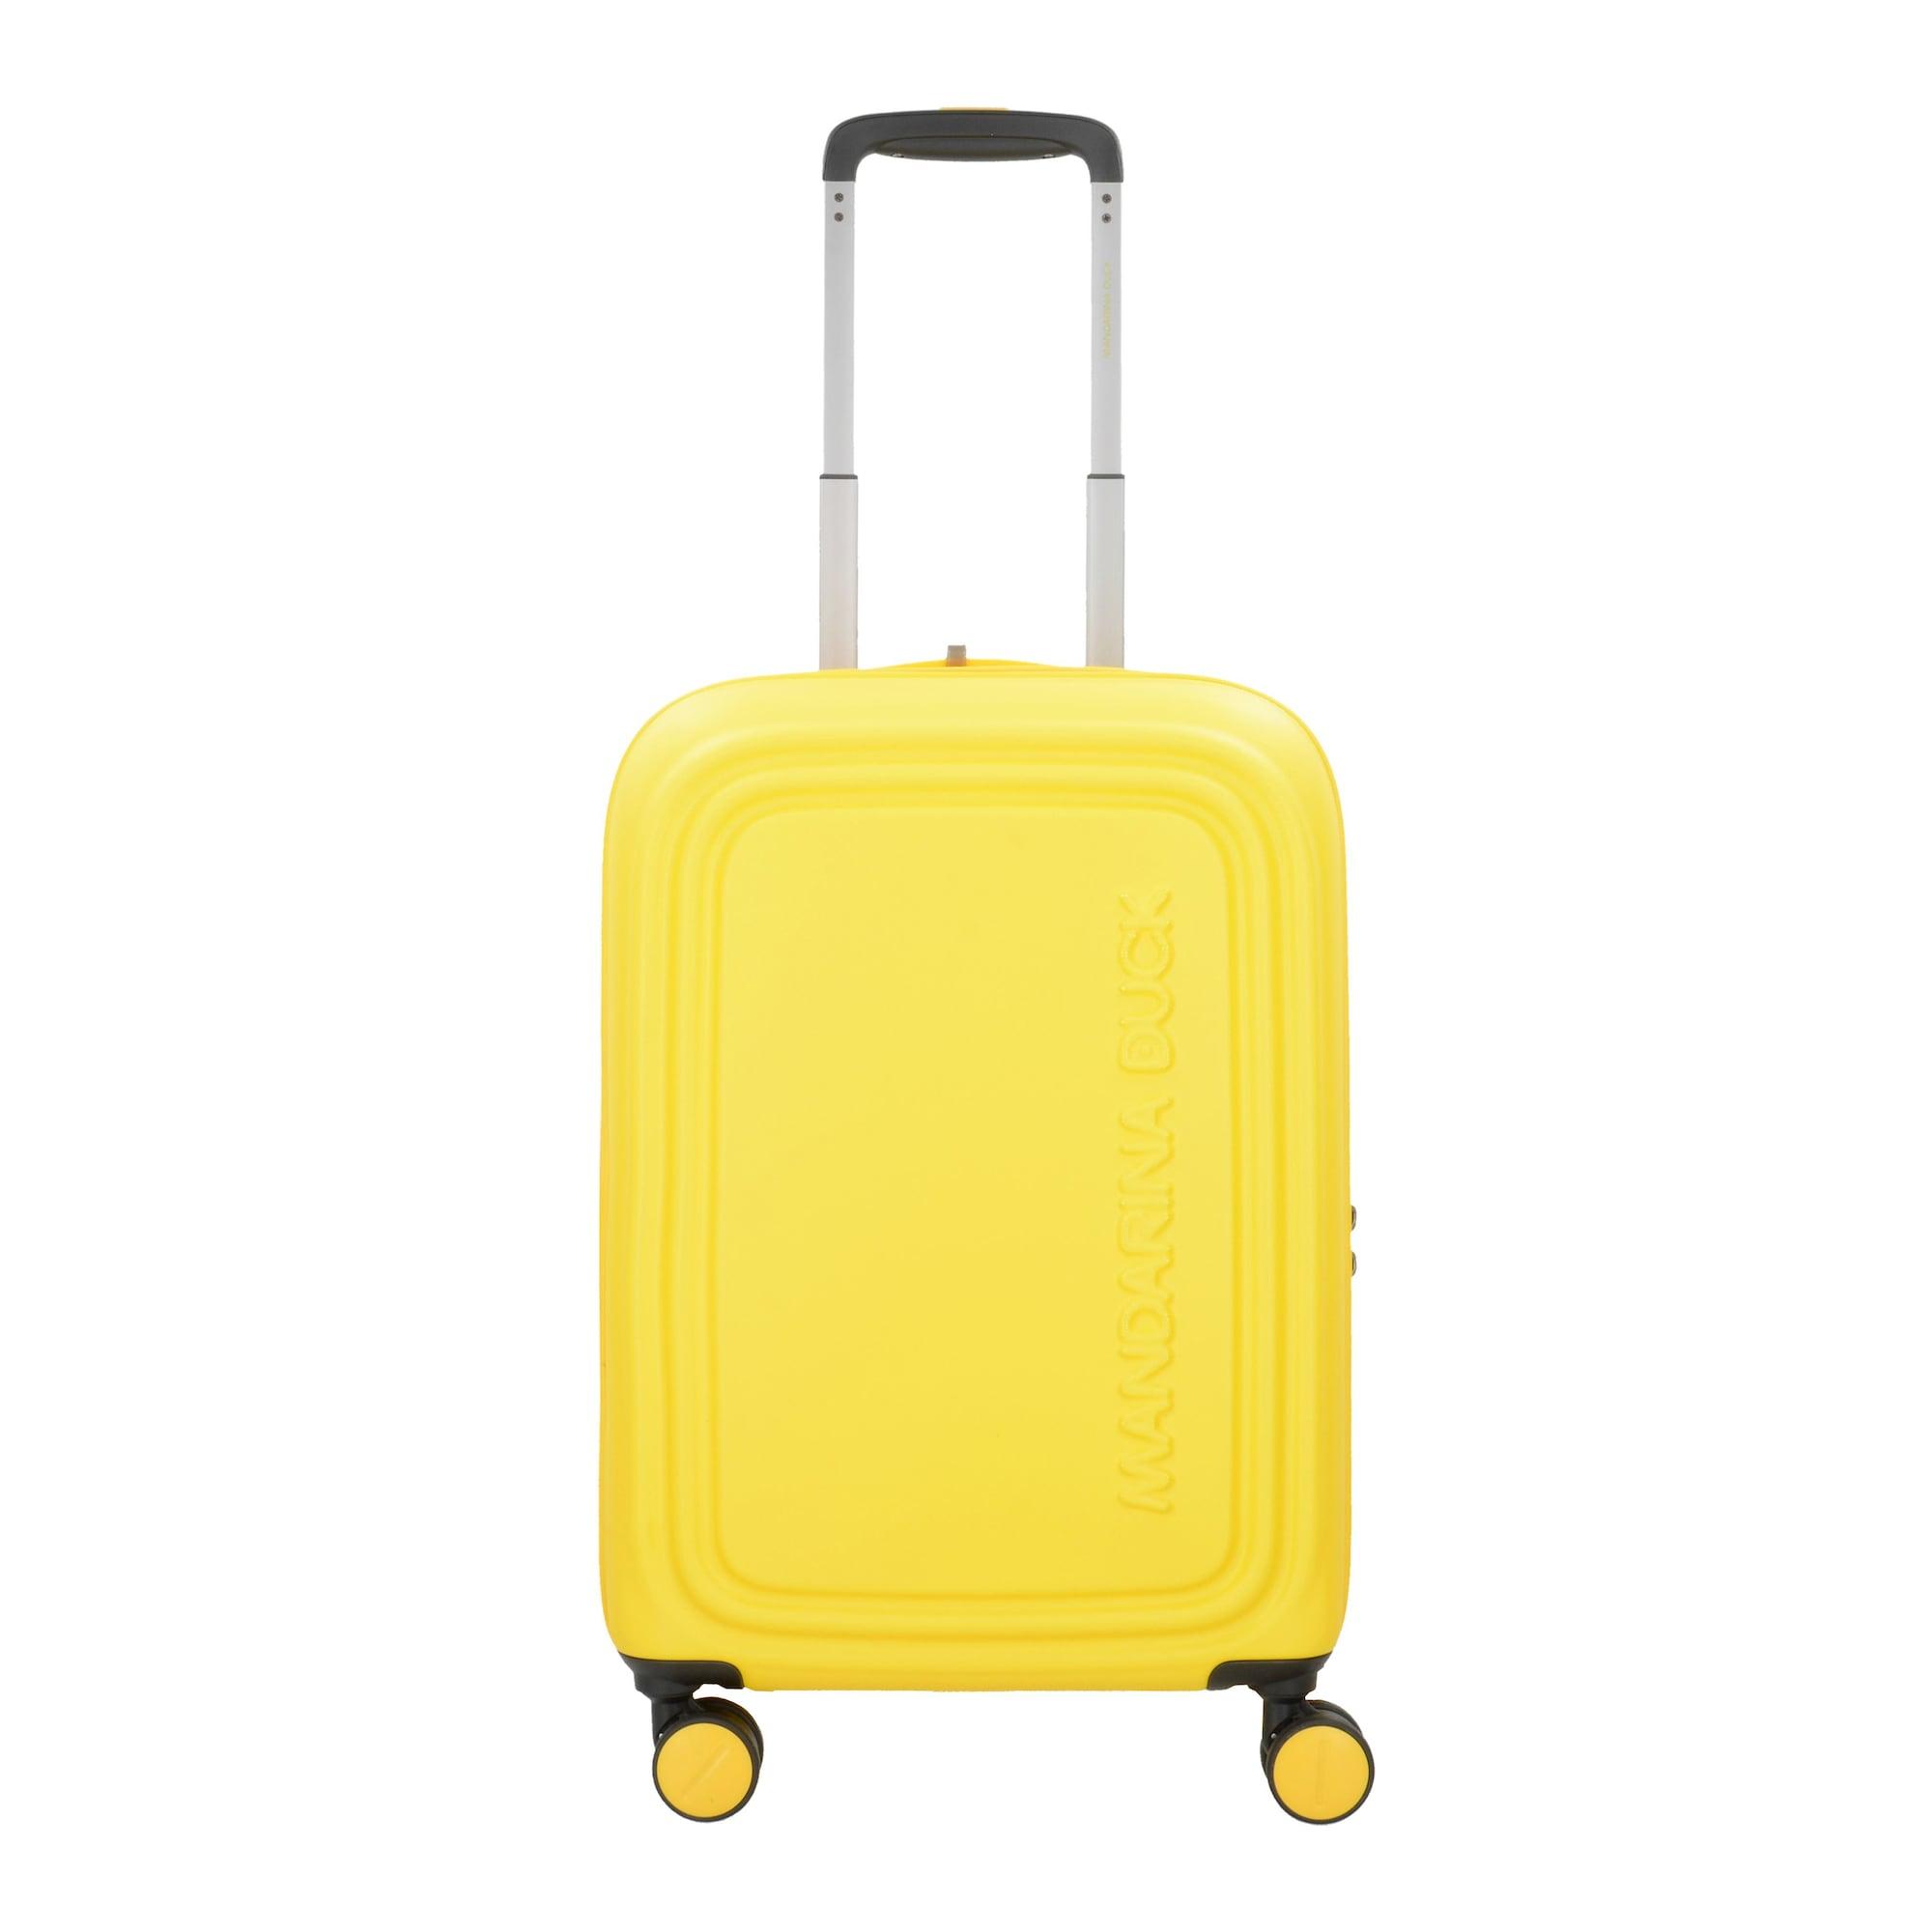 Trolley | Taschen > Koffer & Trolleys > Trolleys | Gelb | Mandarina Duck